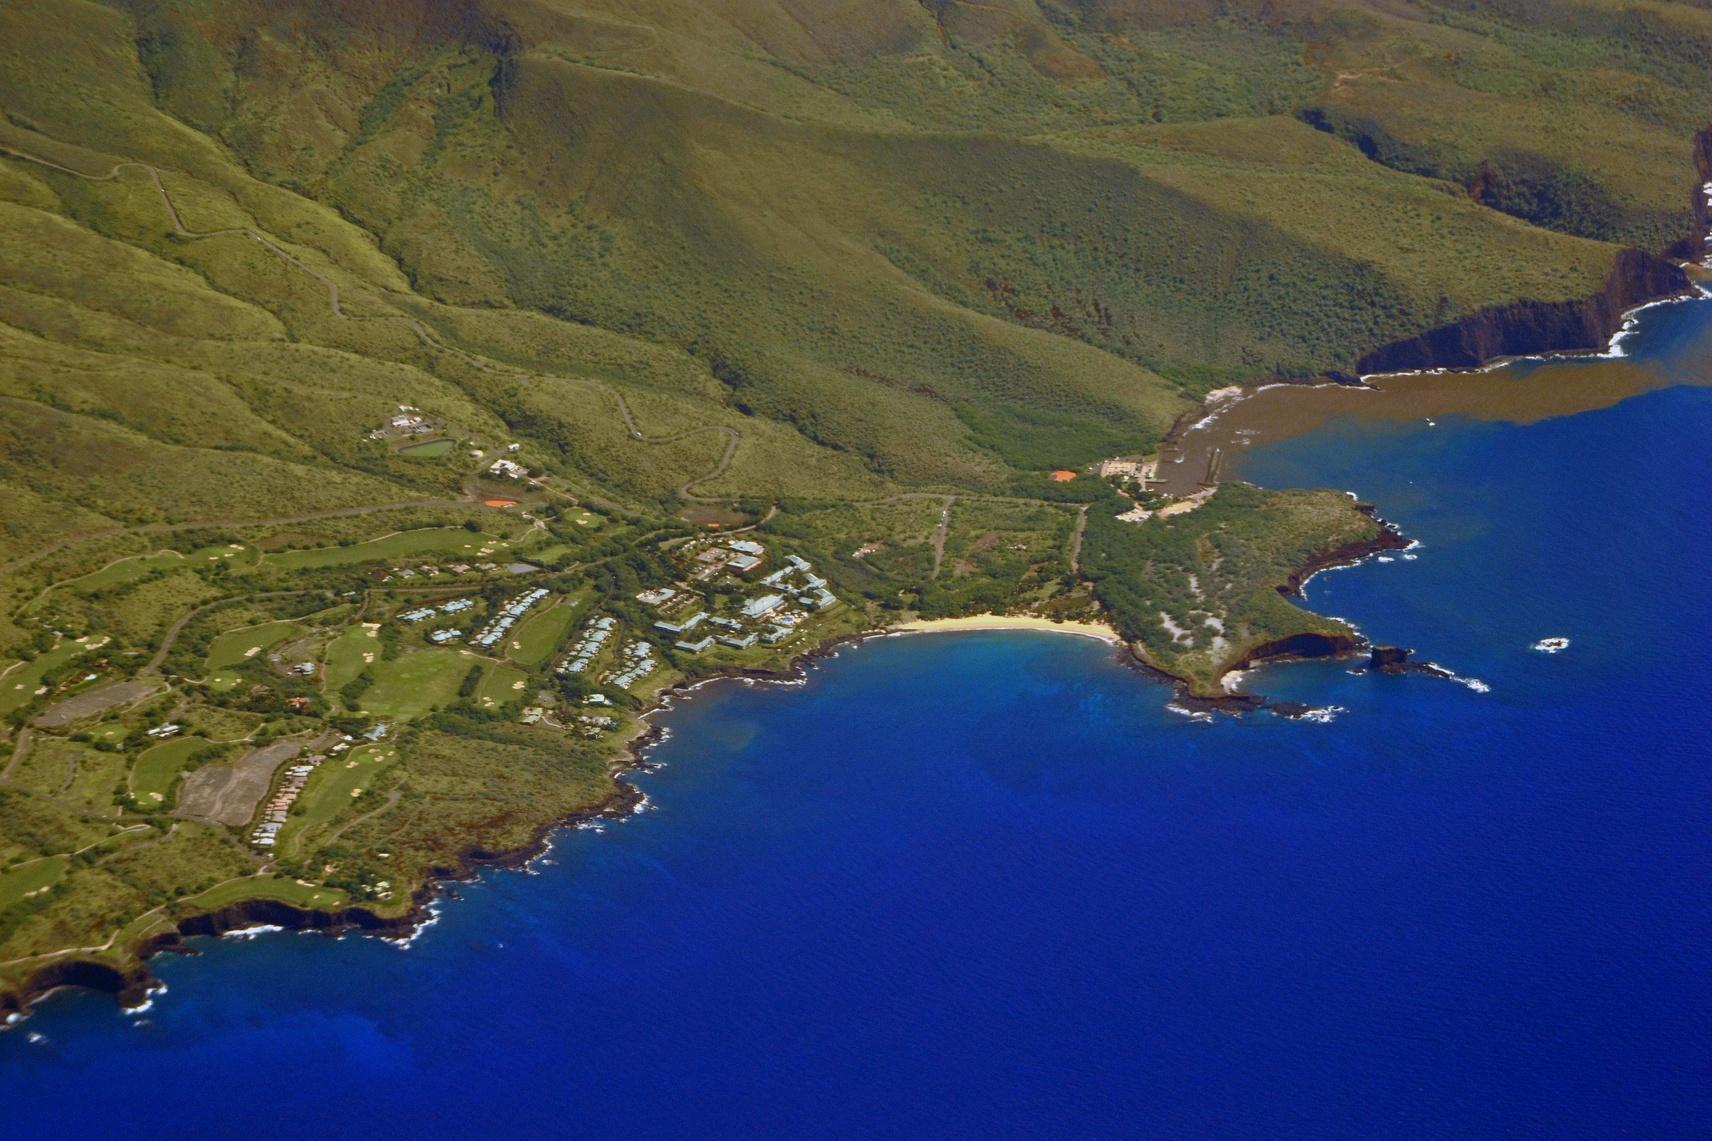 Aerial view of Hulopoe Beach and Puu Pehe or Sweetheart Rock. Lanai Island. Hawaii. USA